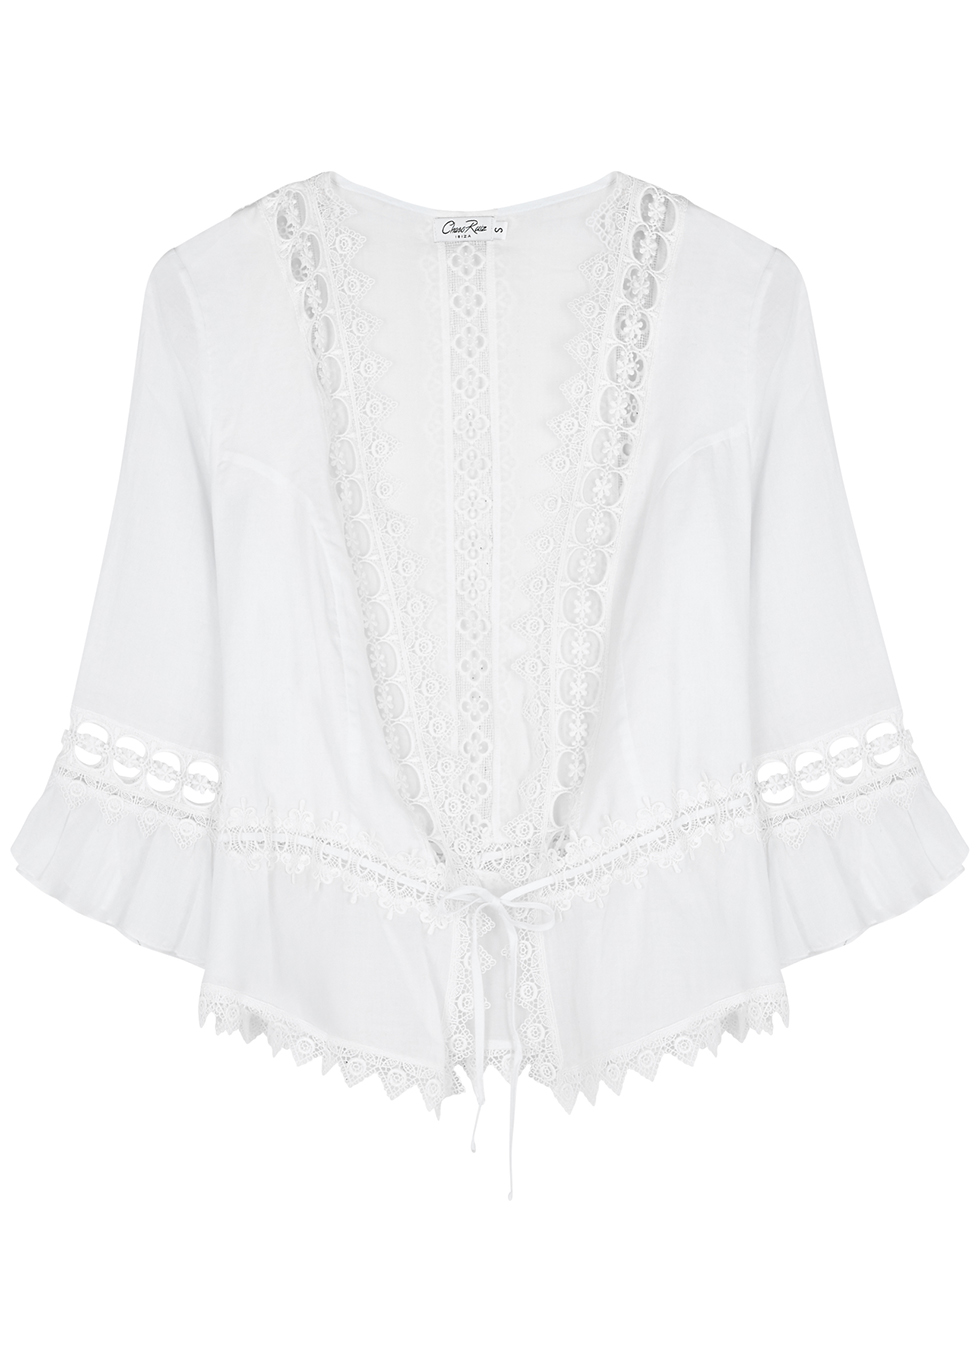 Edda white lace-trimmed cotton-blend top